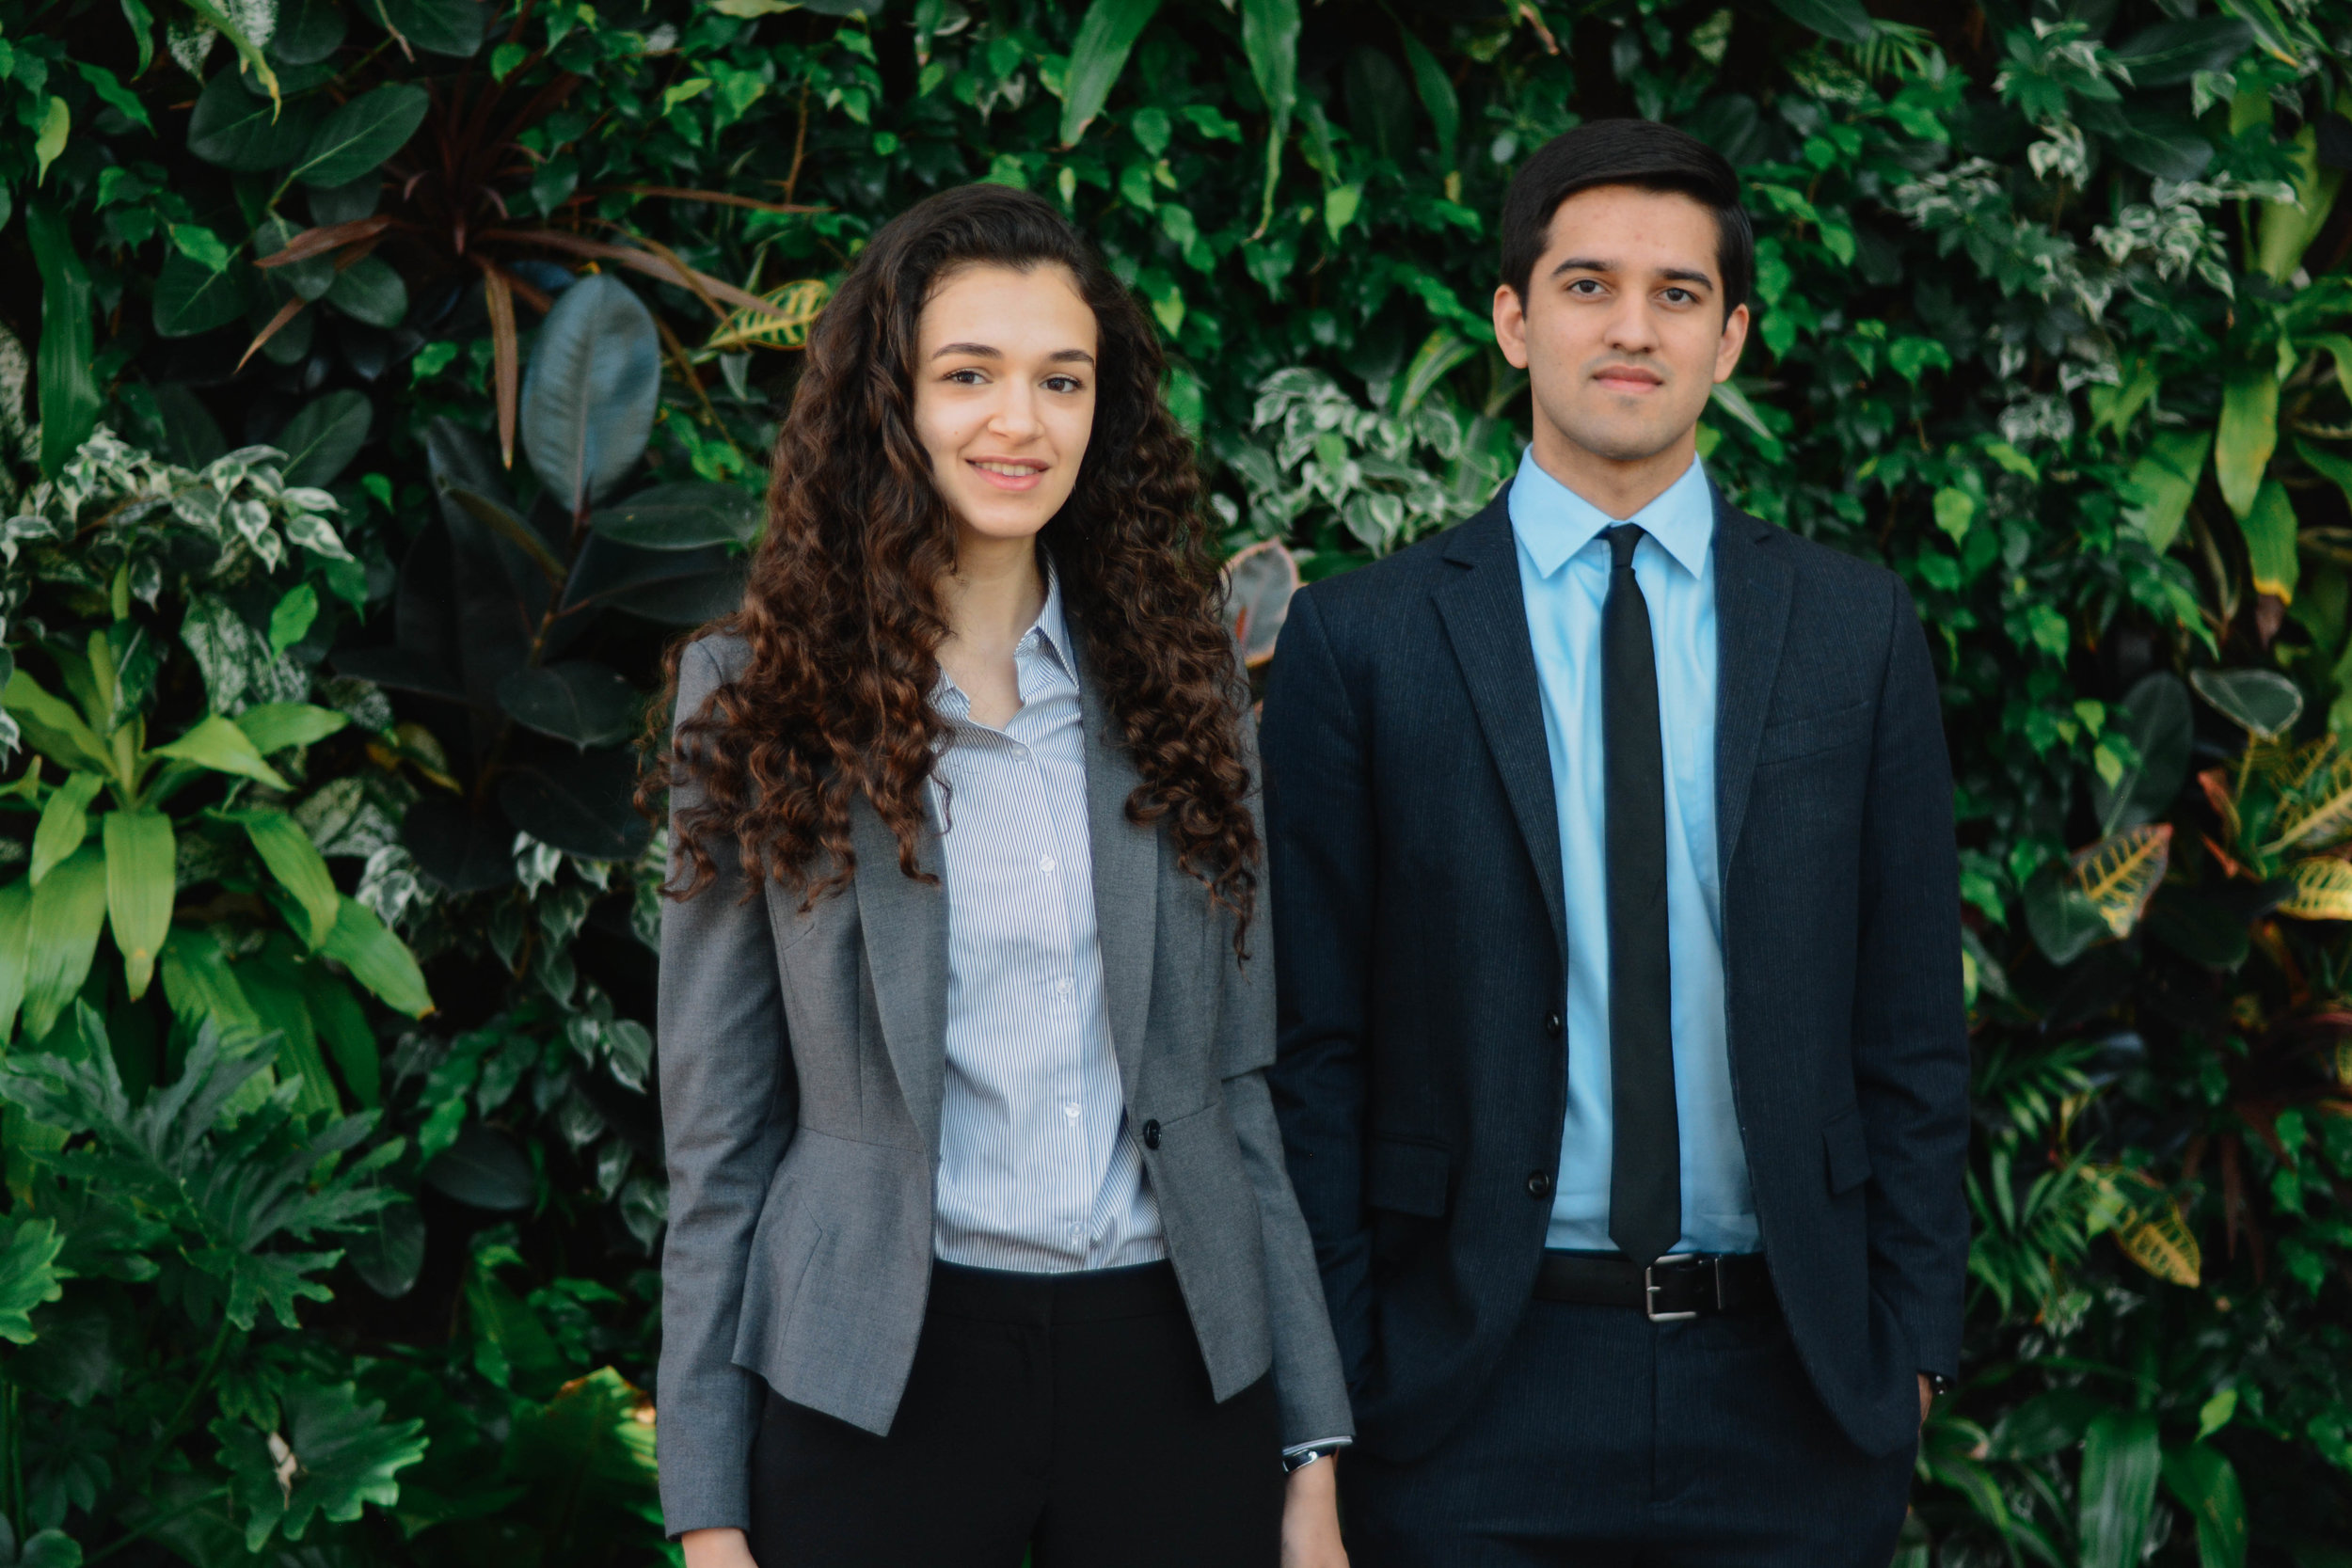 DeepBreaths - A digital platform for school counselors to keep track of students' mental health.YARA EL-TAWIL, SUBHAN CHAUDRY